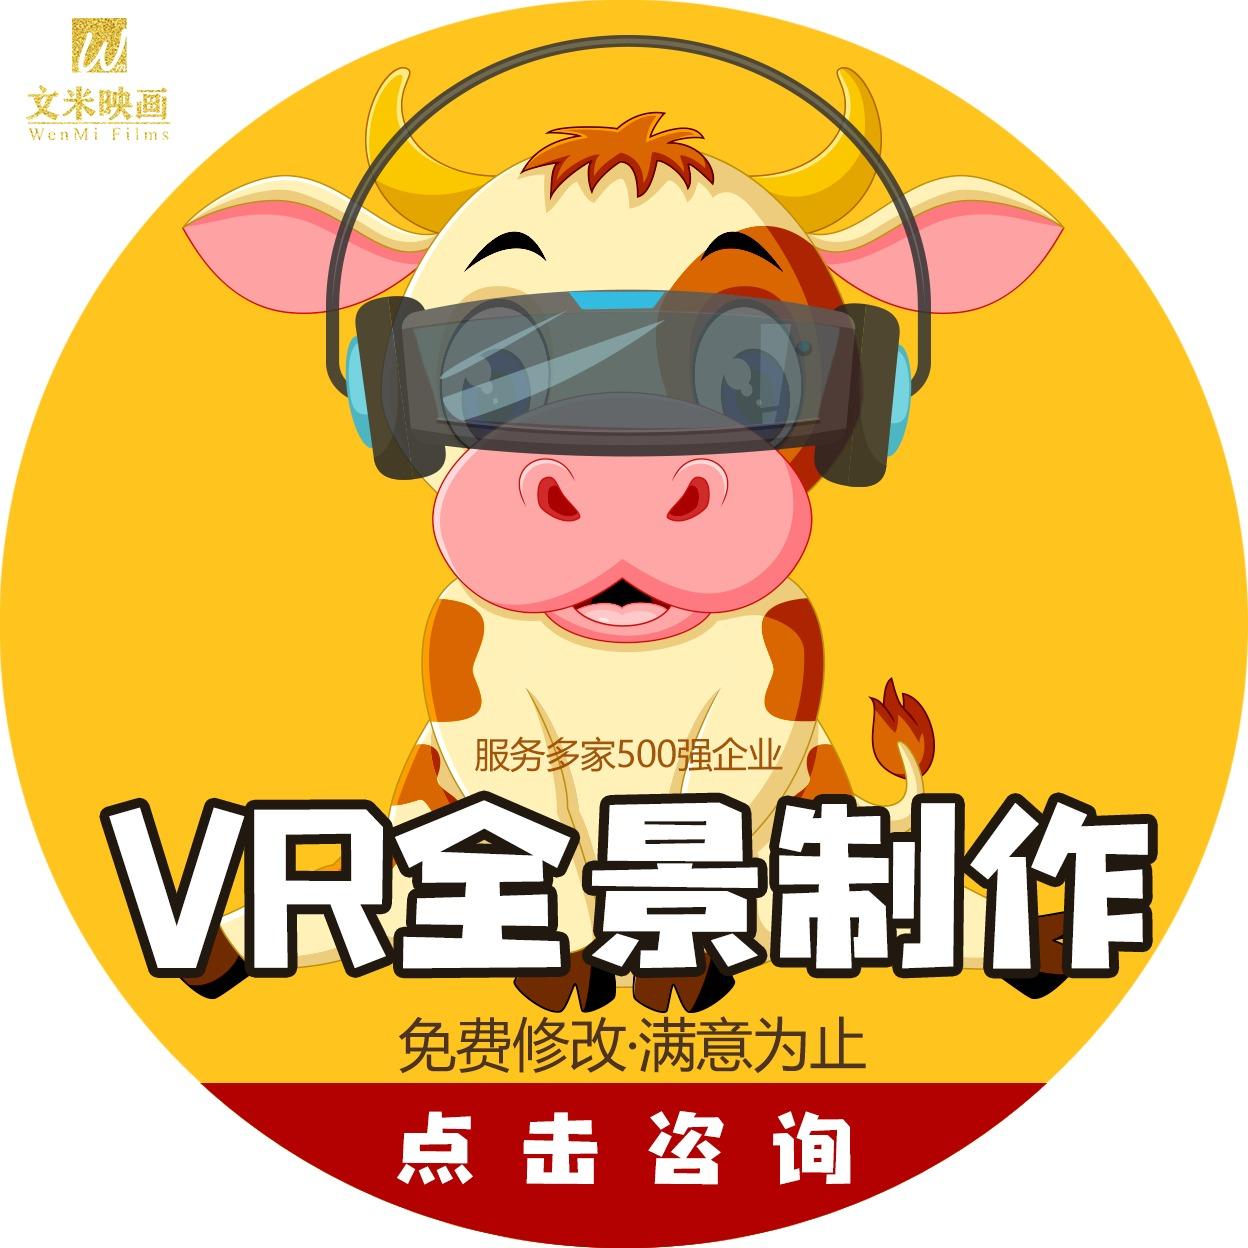 VR/3DVR场景制作VR效果图VR全景线上展馆搭建上传